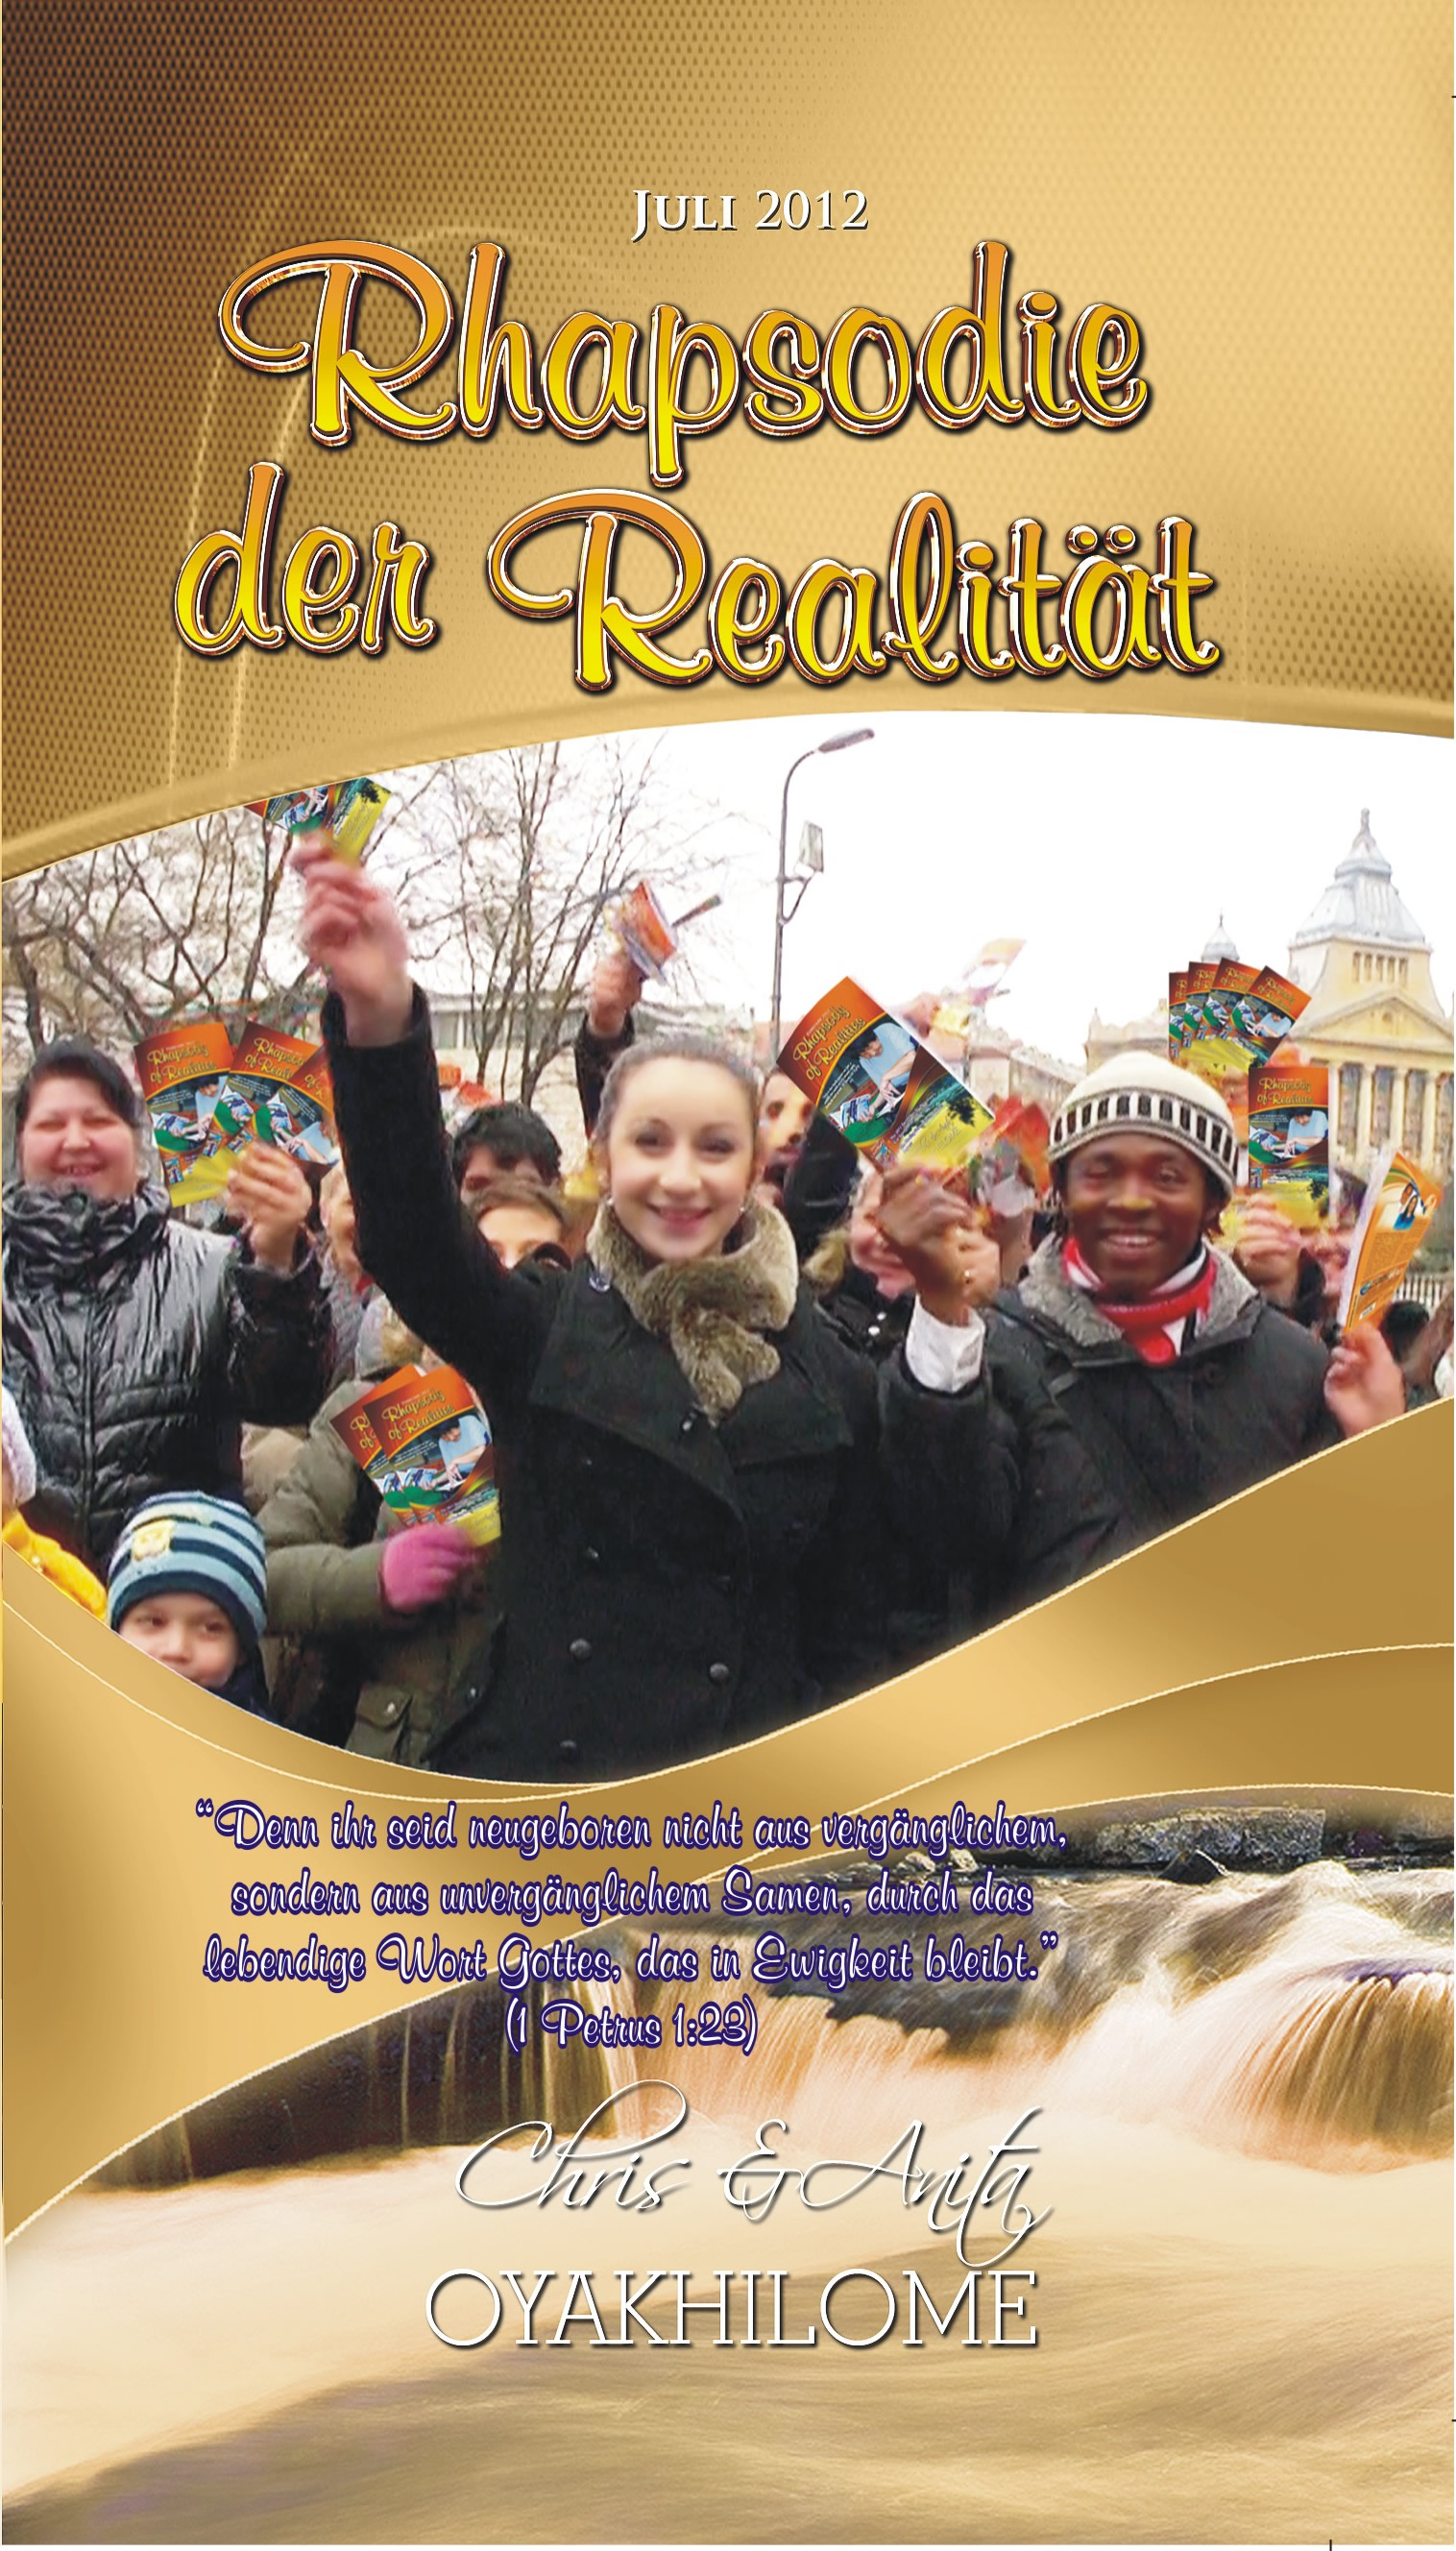 Pastor Chris and Anita Oyakhilome - Rhapsody of Realities July 2012 German Edition